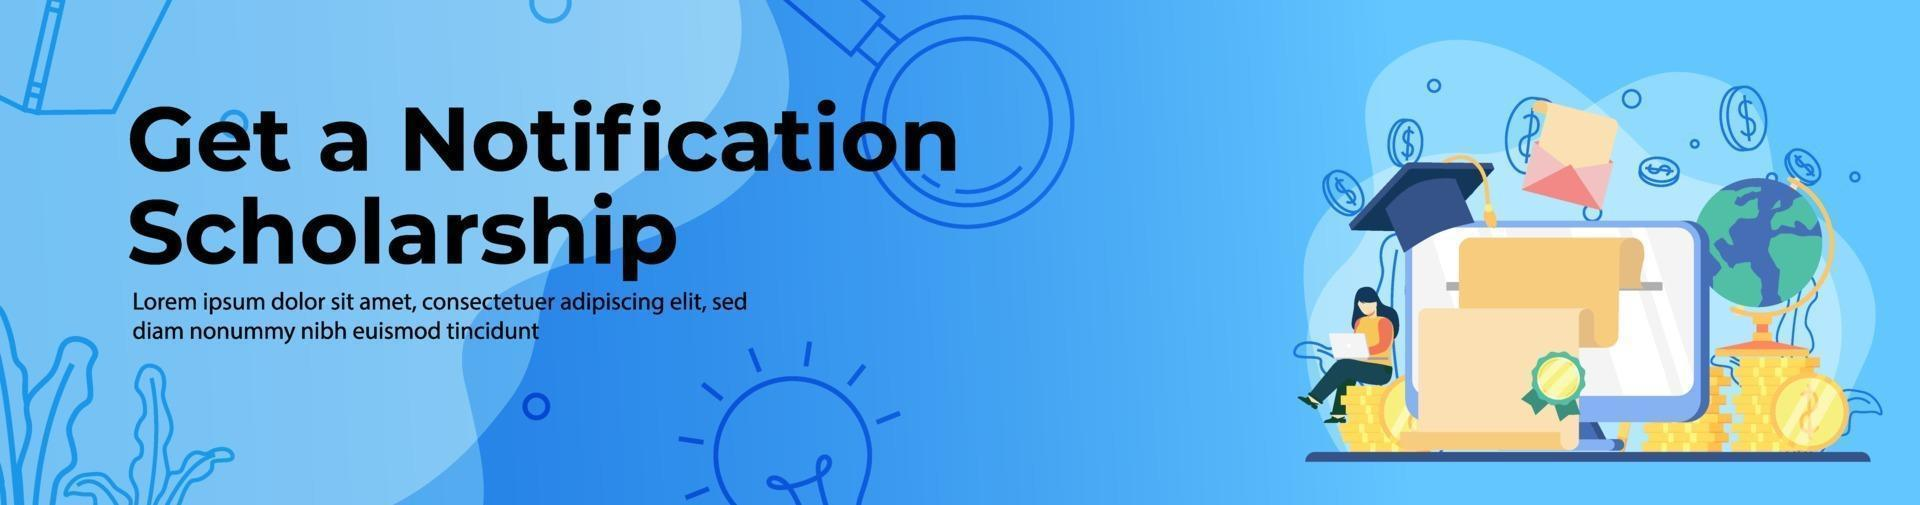 Scholarship Education Web Banner Design vector